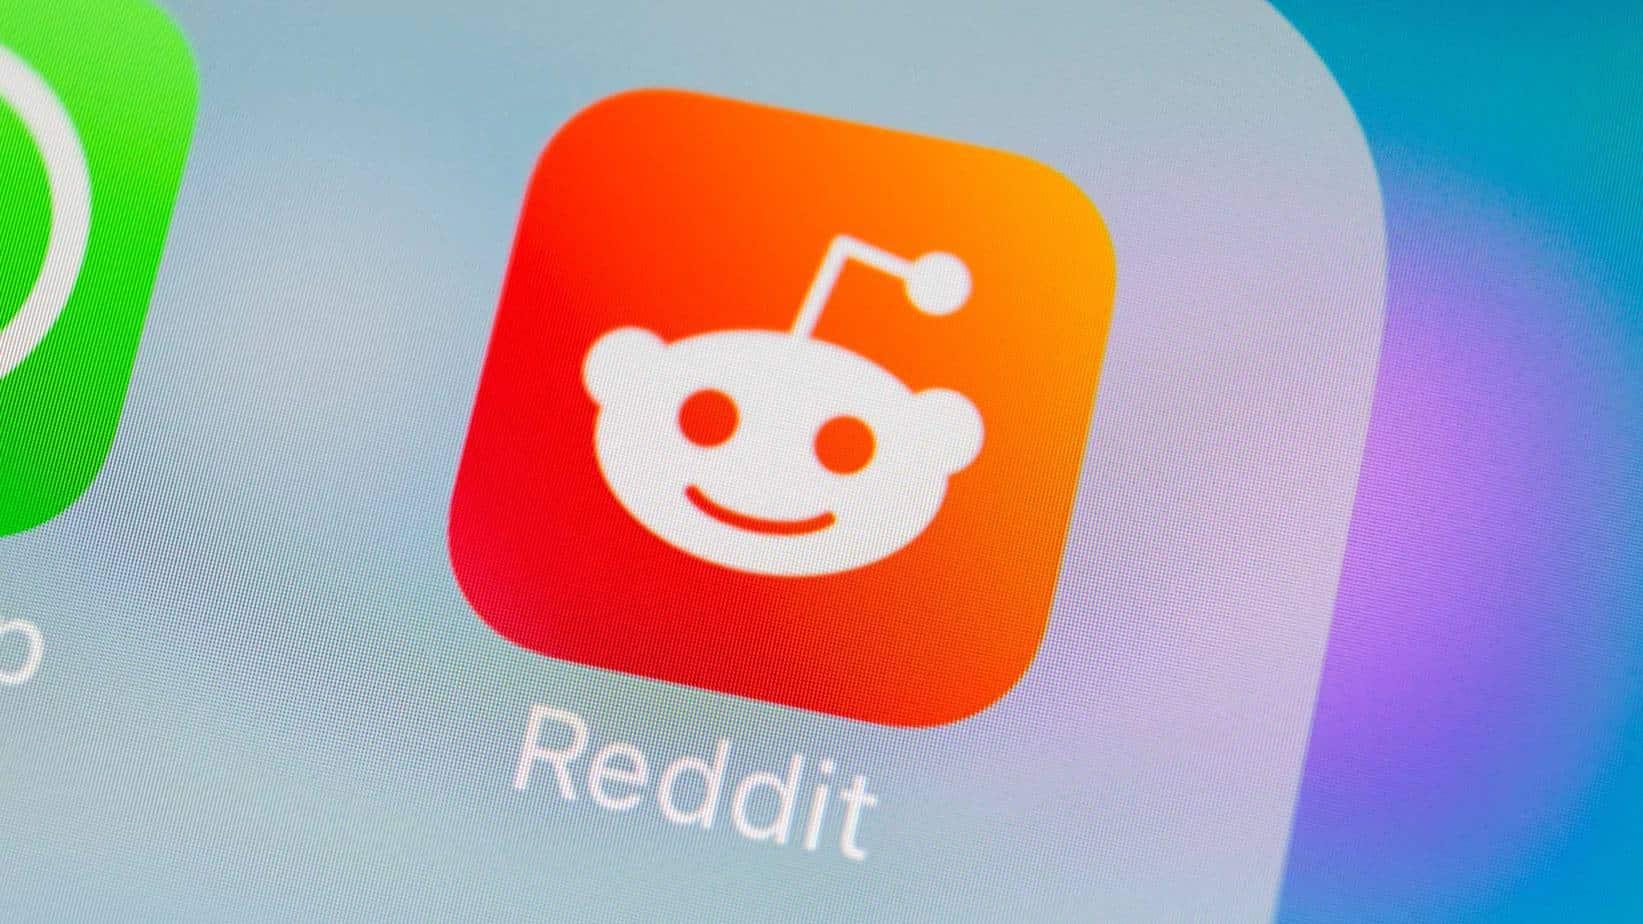 Reddit Ads